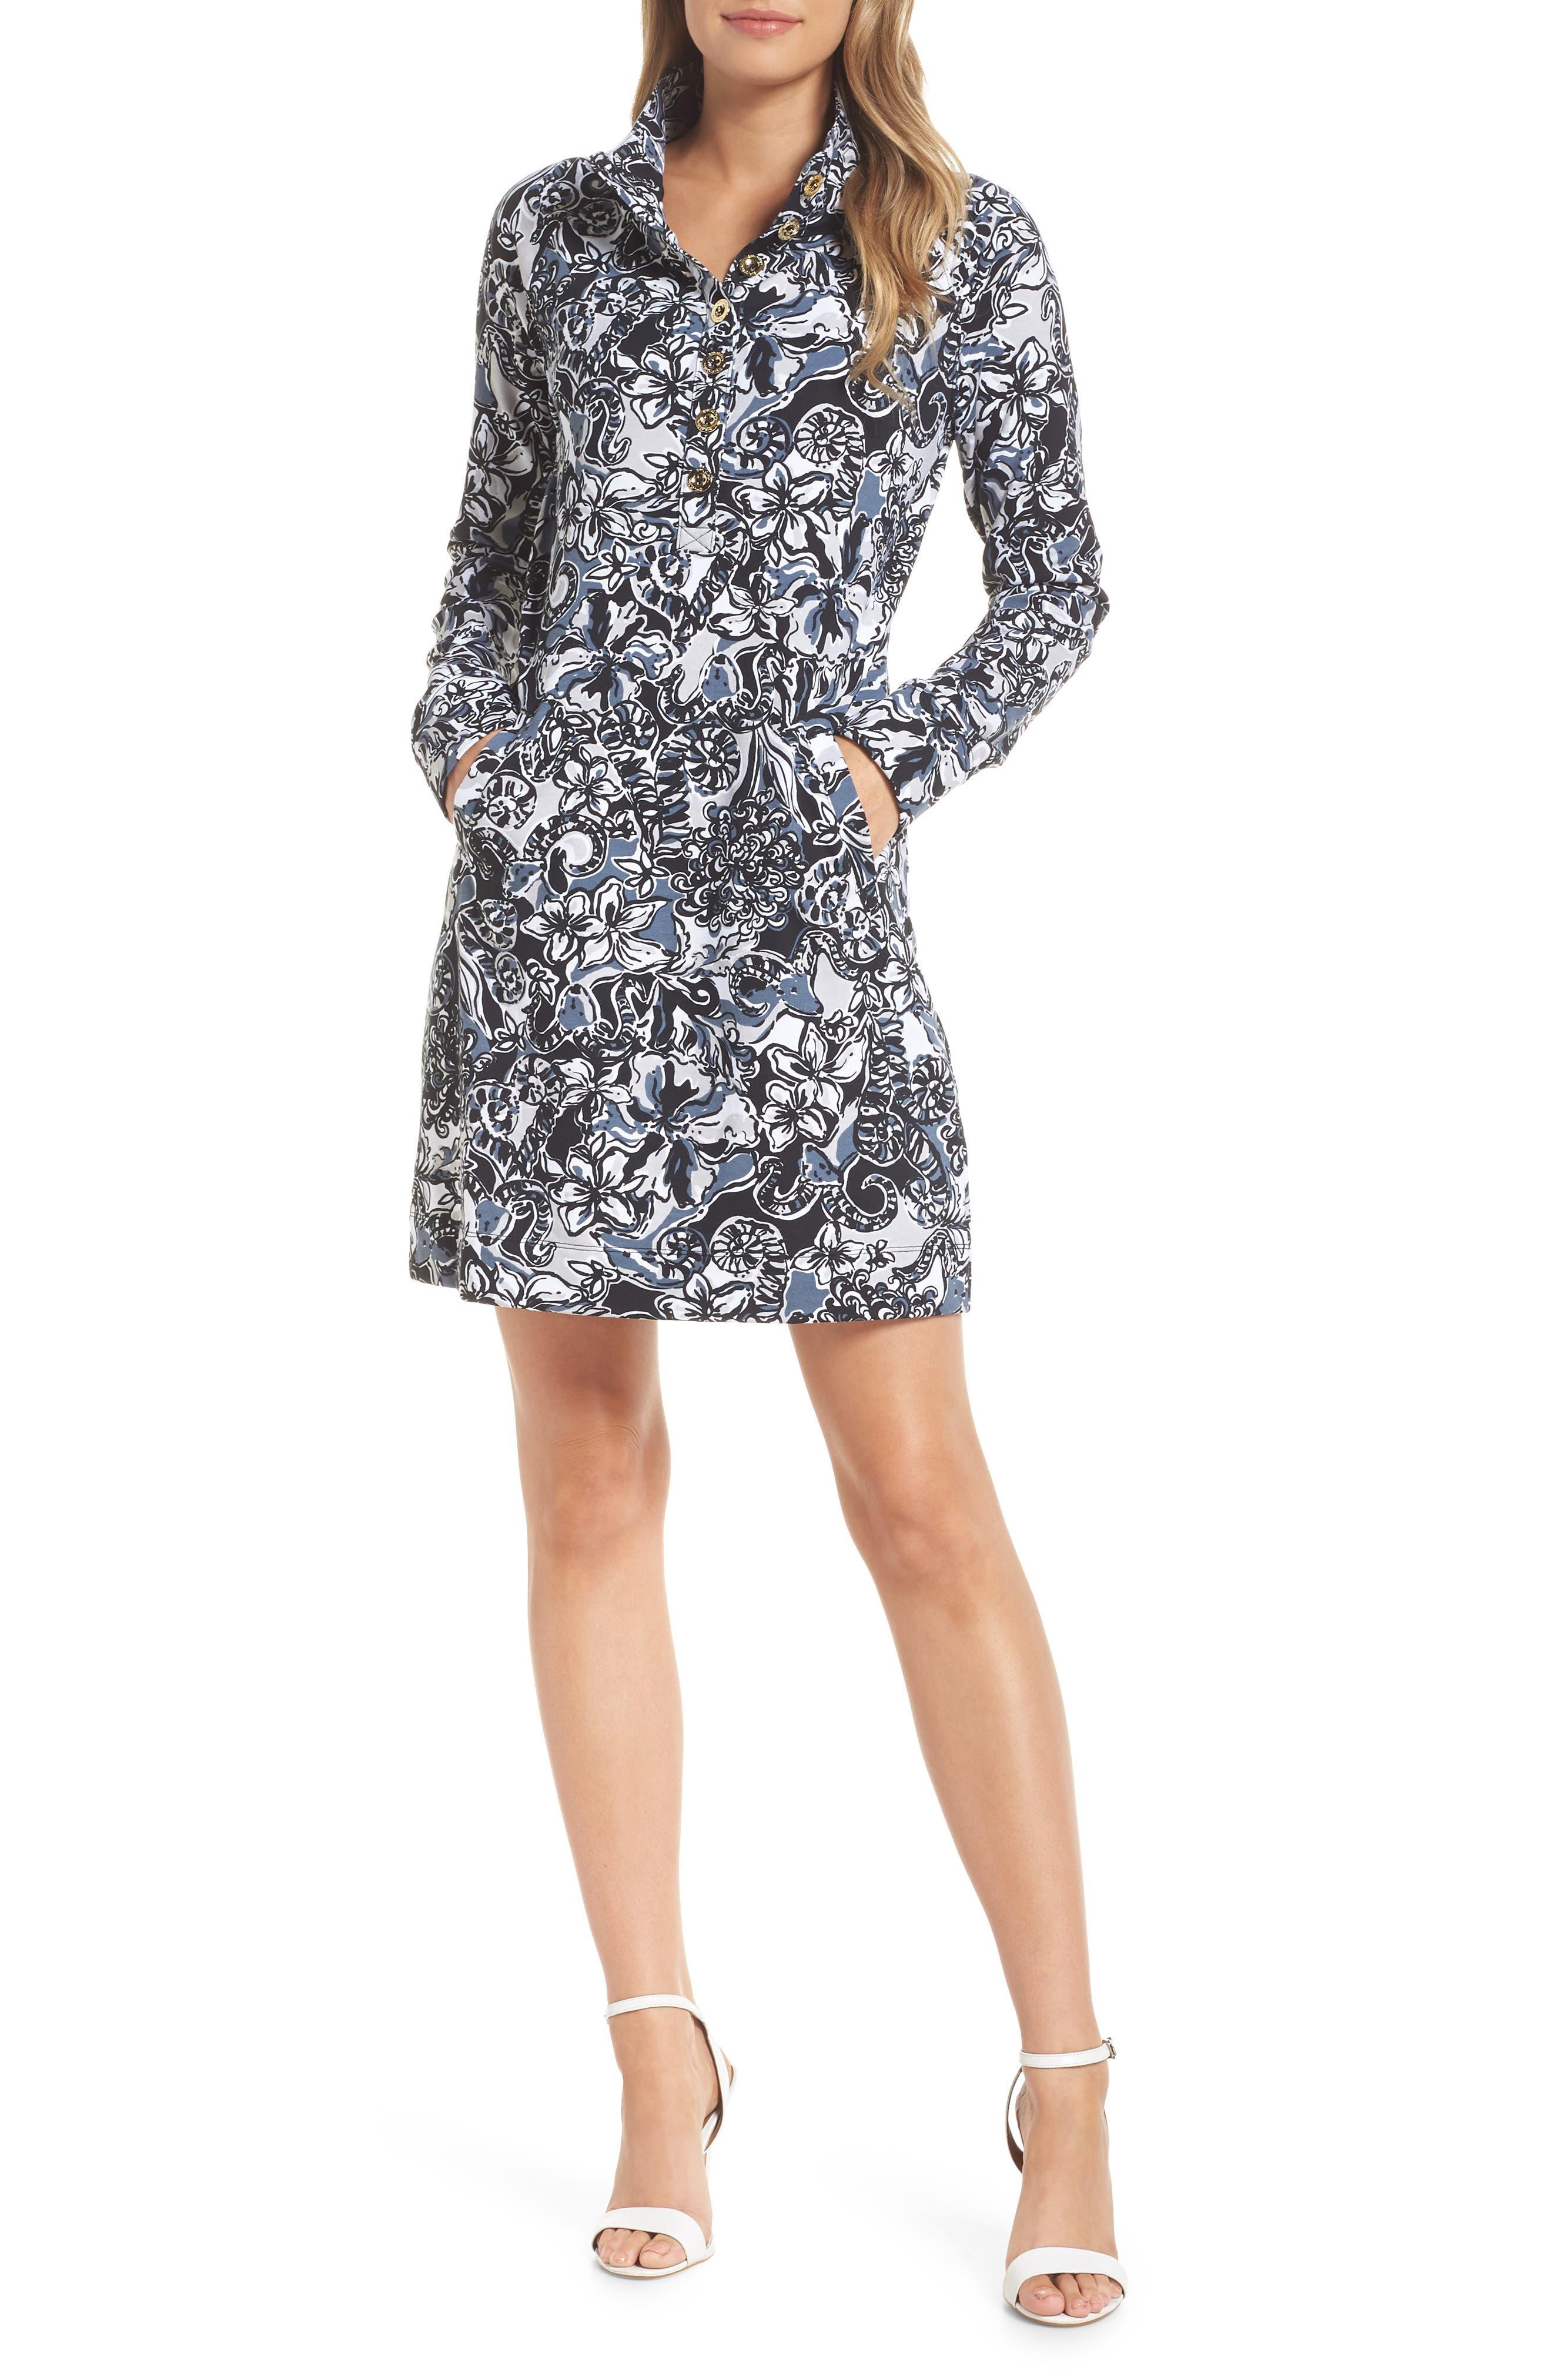 Lilly Pulitzer Captain Upf 50+ Shift Dress